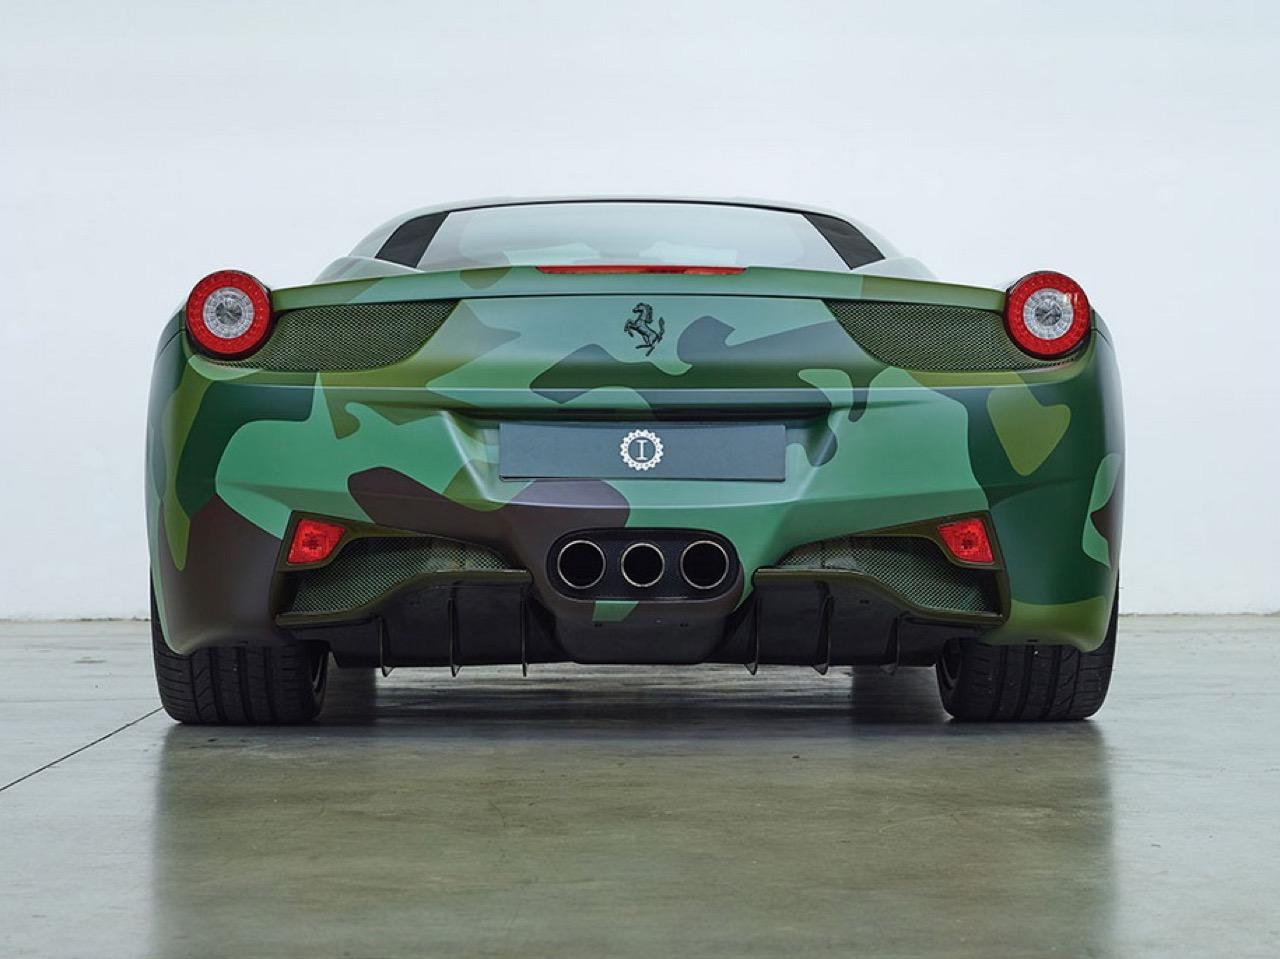 Ferrari 458 Italia Lapo Elkann in auction (5)